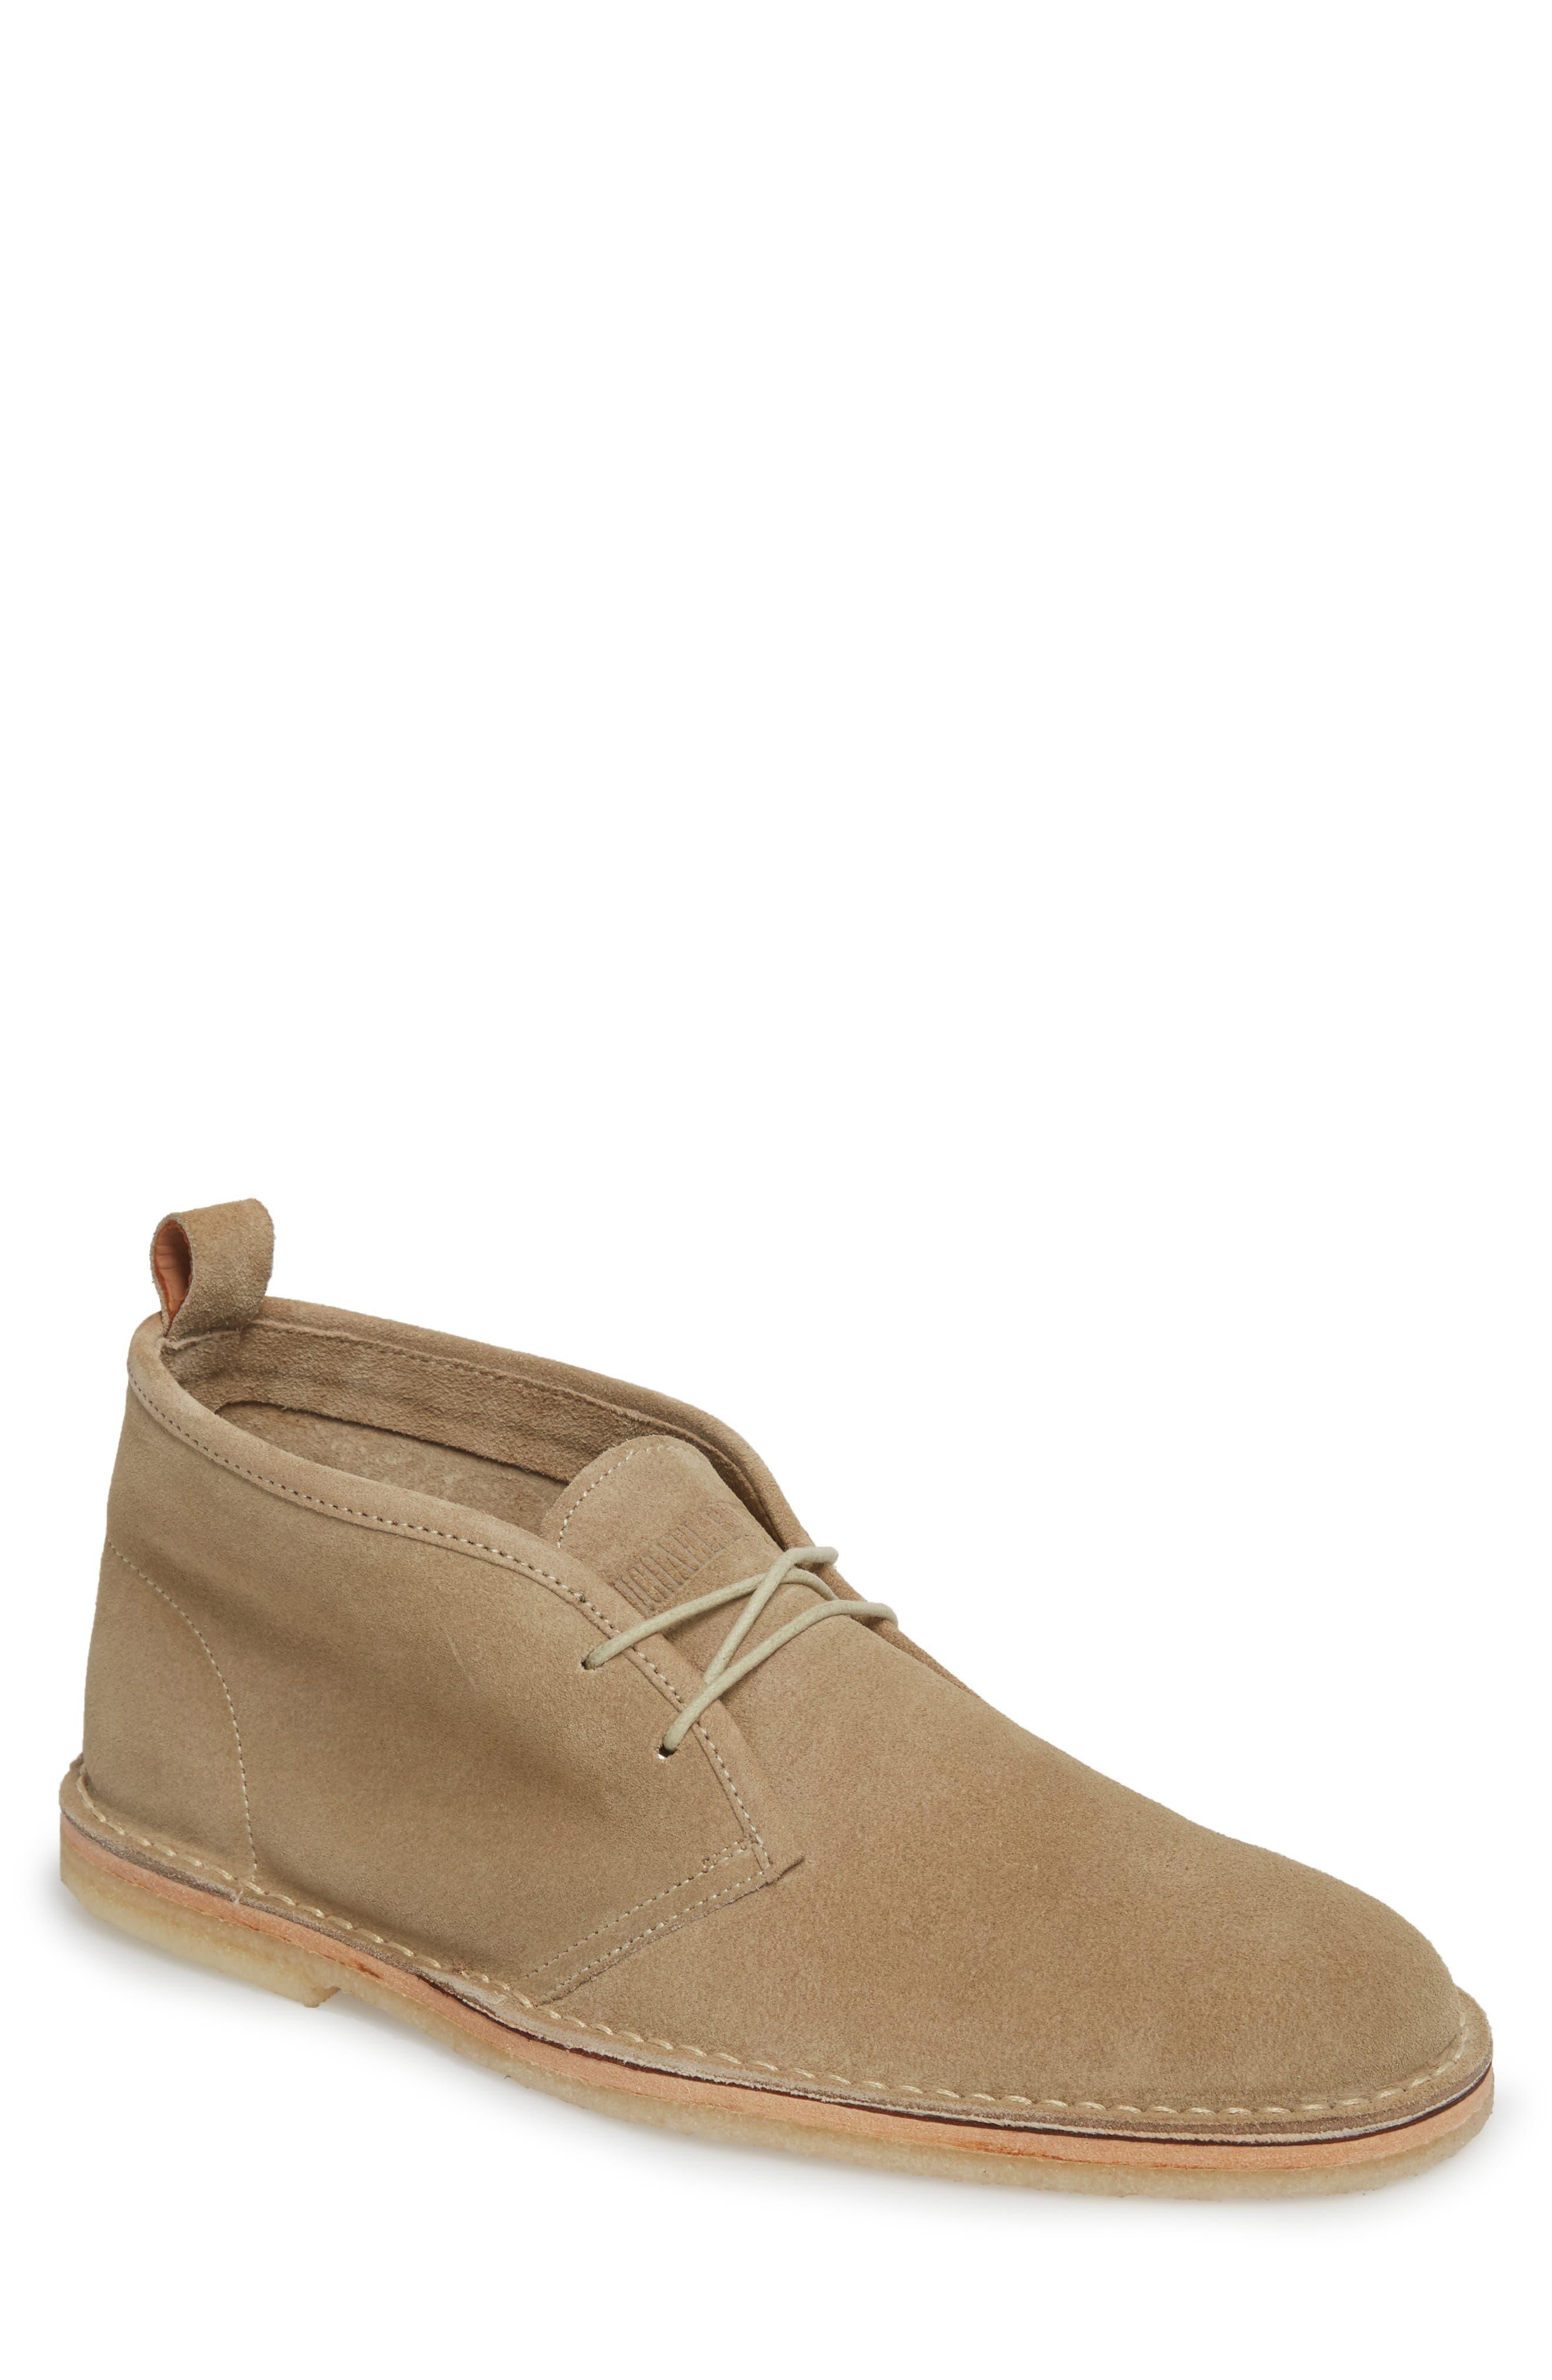 Stitchout Chukka Boot,                         Main,                         color, 250